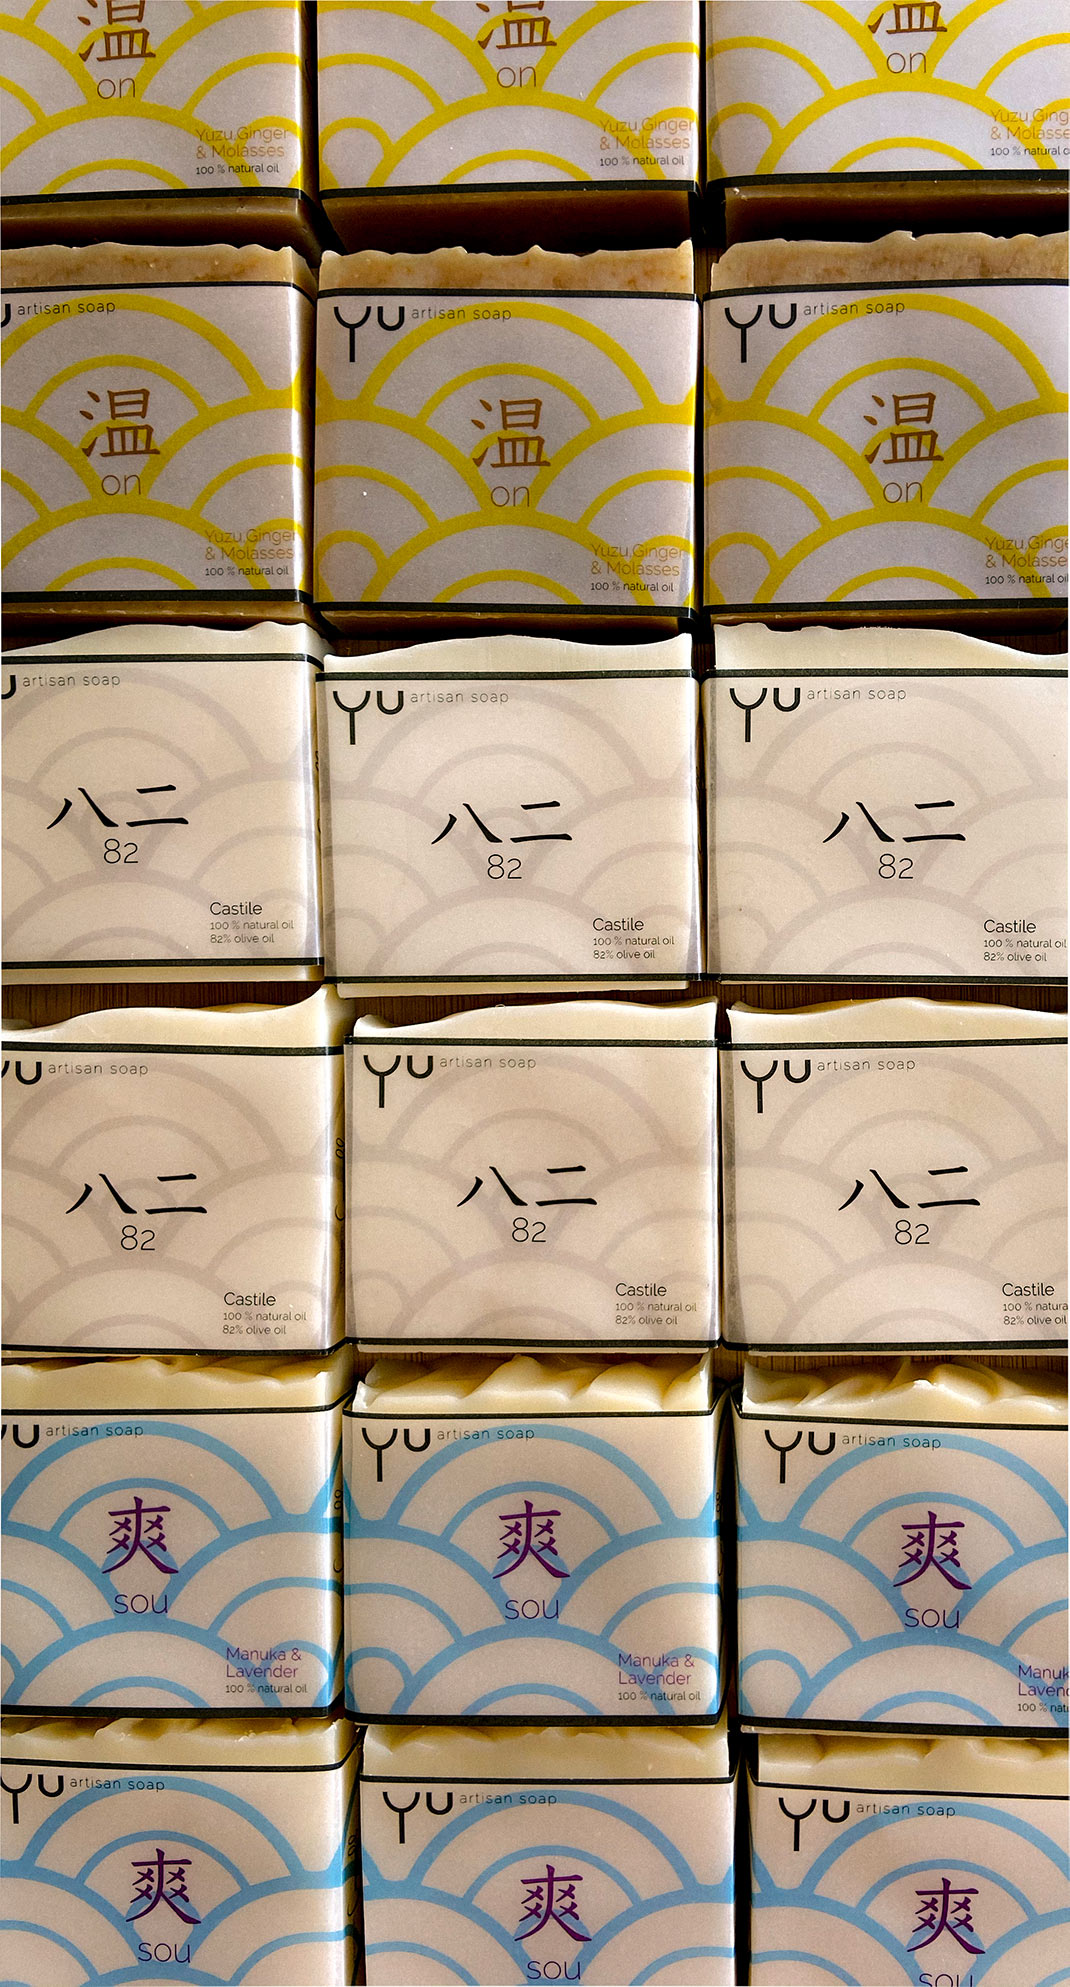 wall of soap.jpg